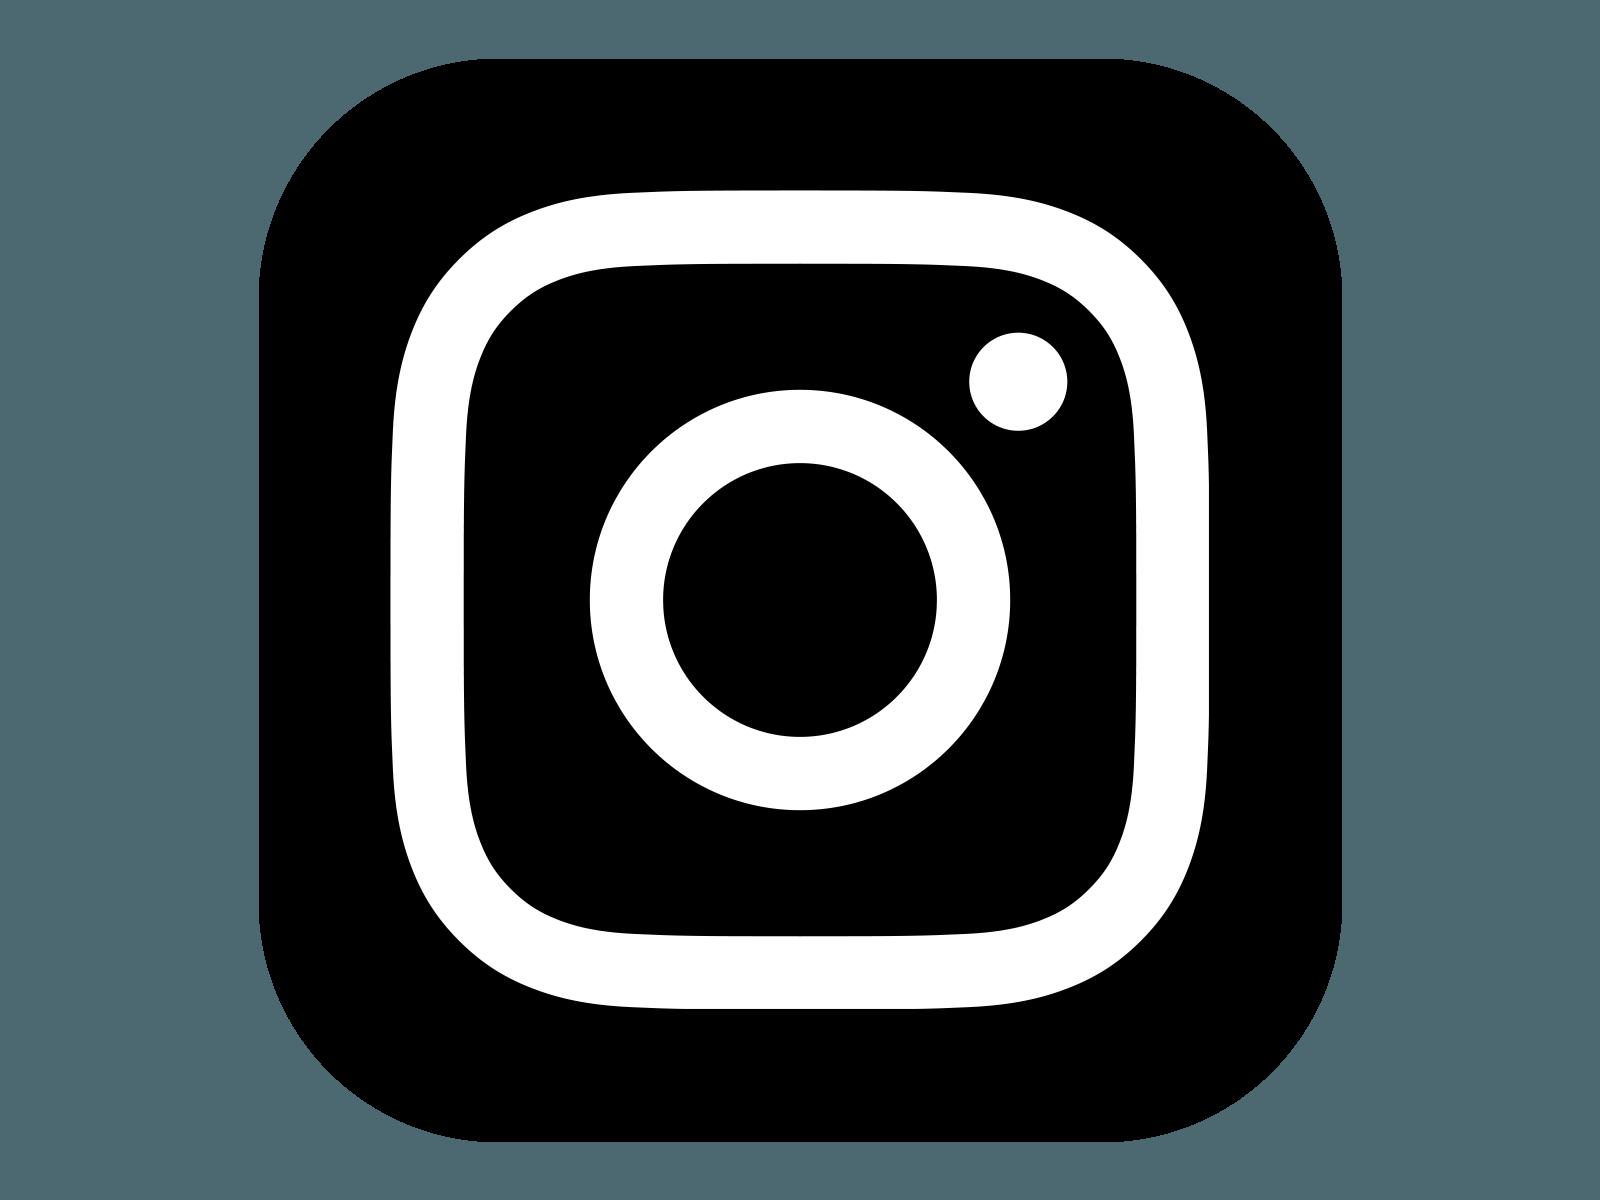 Cute Black and White Instagram Logo - LogoDix